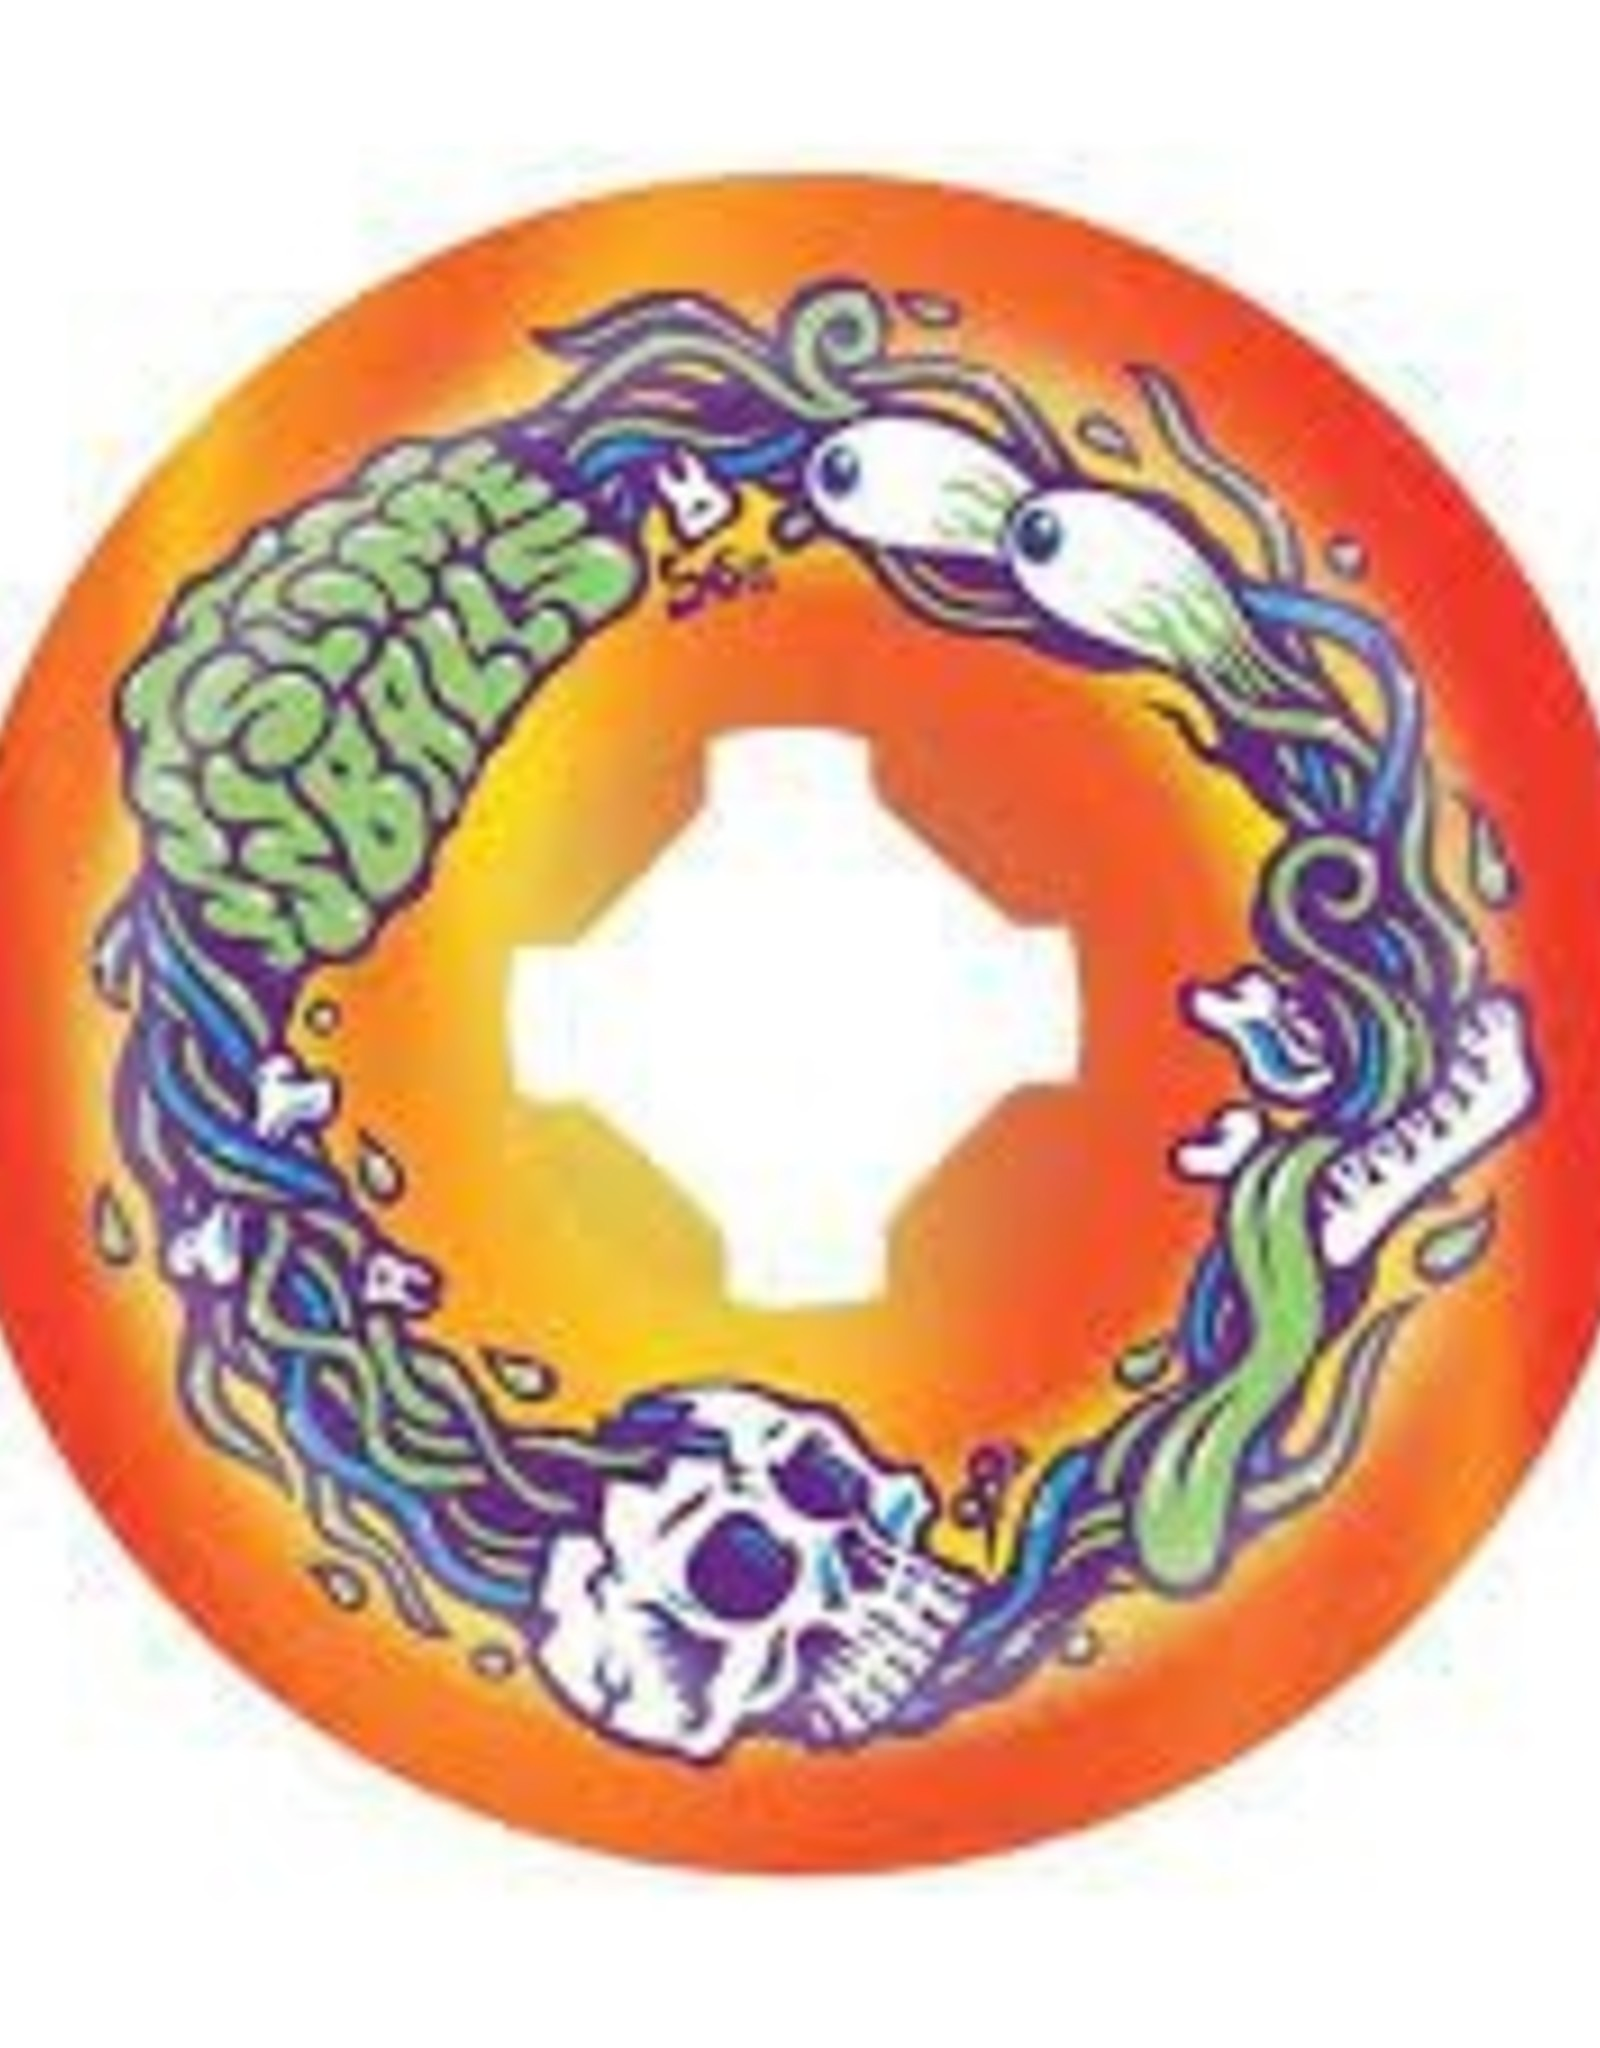 Slimeballs SLIME BALLS BRAINS SPEED BALLS ORN/YEL SWIRL 99A 56mm